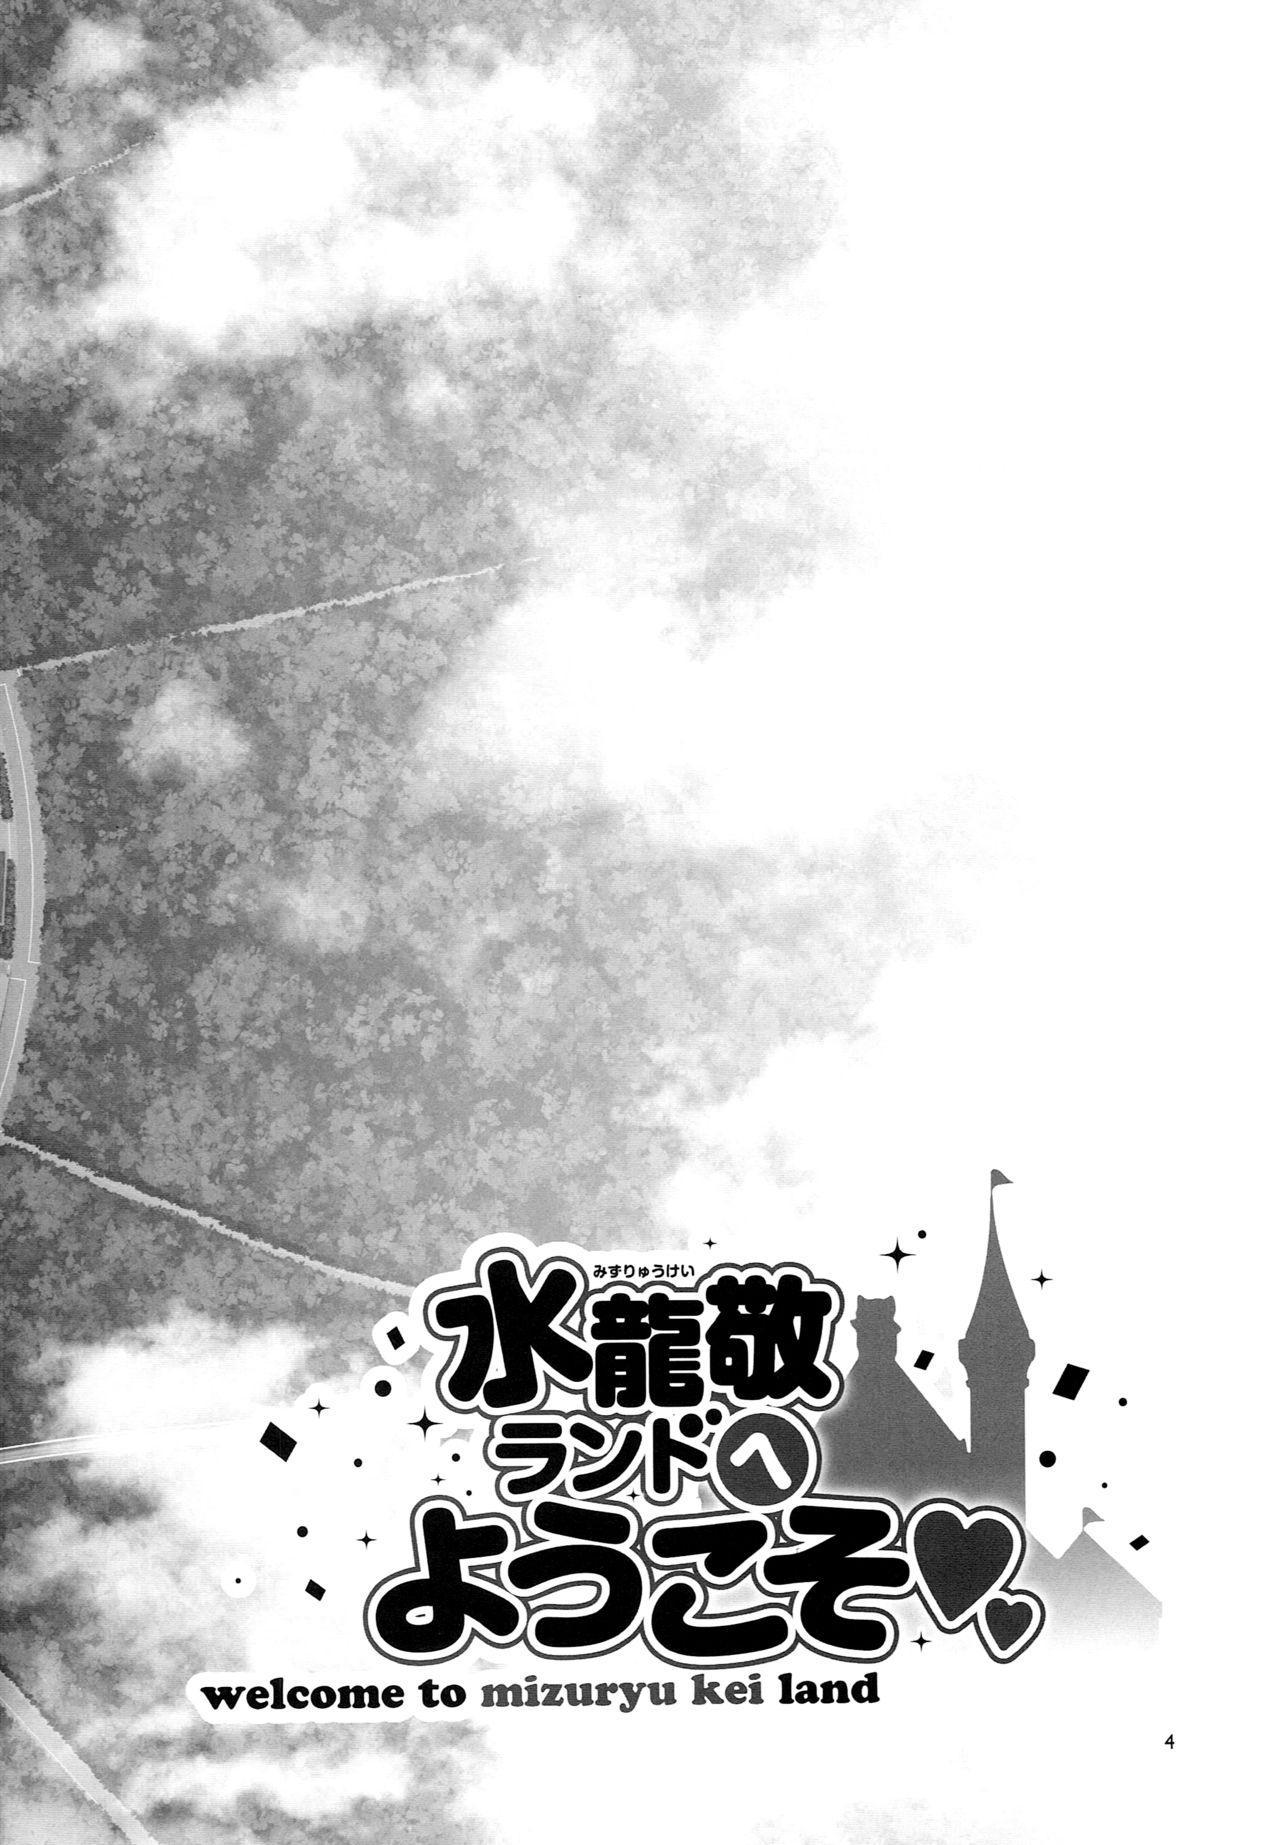 Oideyo! Mizuryu Kei Land the 7th day 2